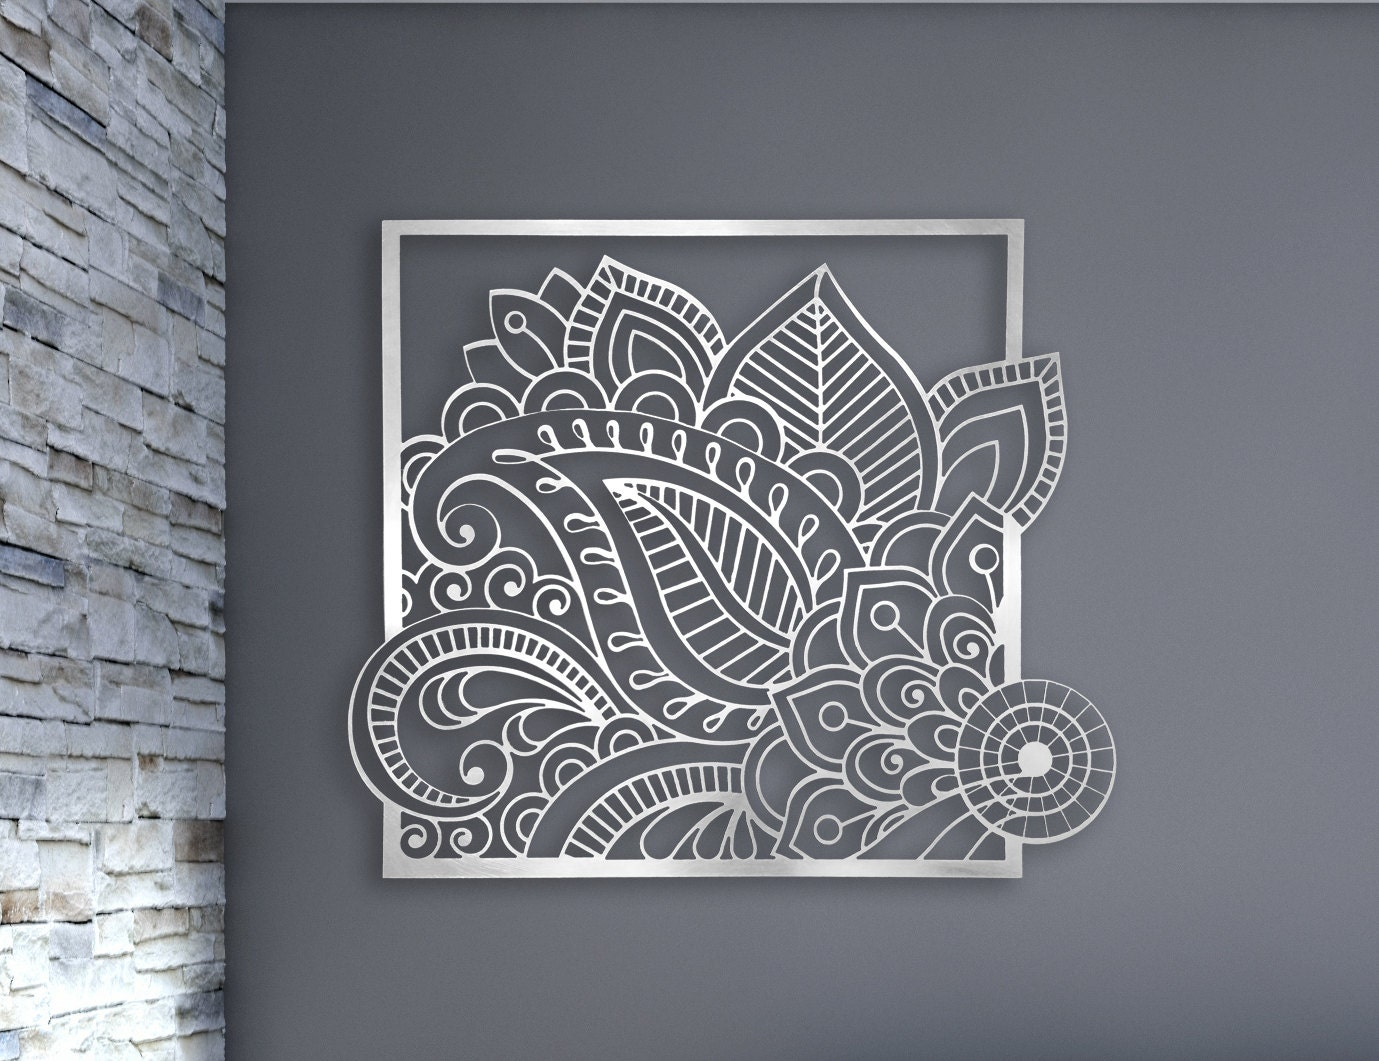 Laser Cut Metal Wall Art : Laser cut metal decorative wall art panel sculpture for home